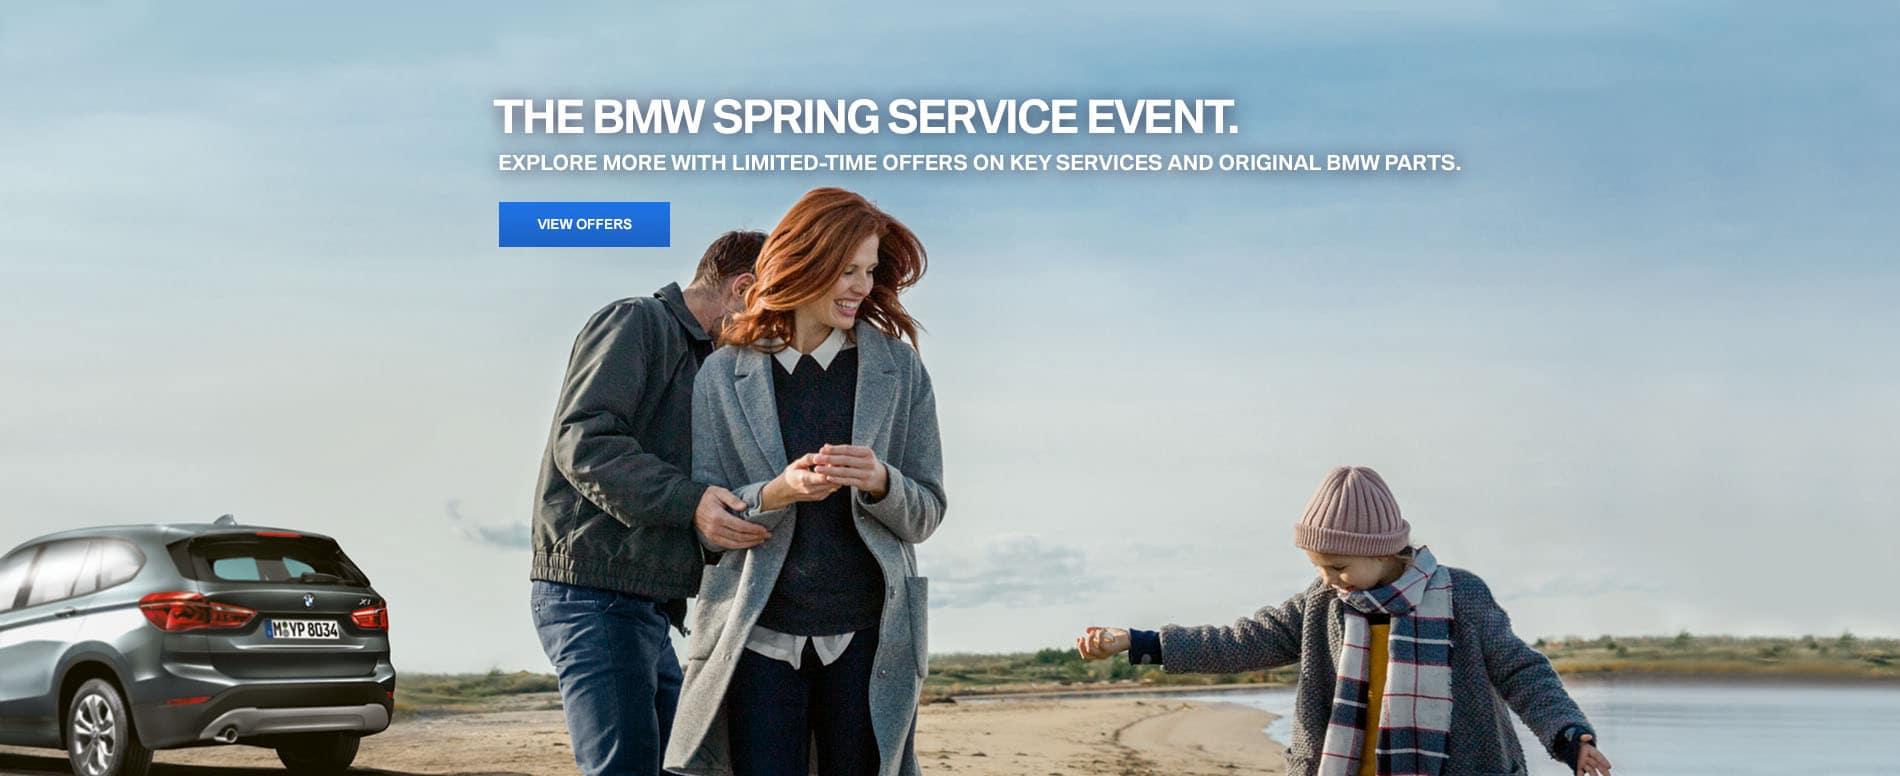 BMW Spring Service Event 2019 - Darien, CT